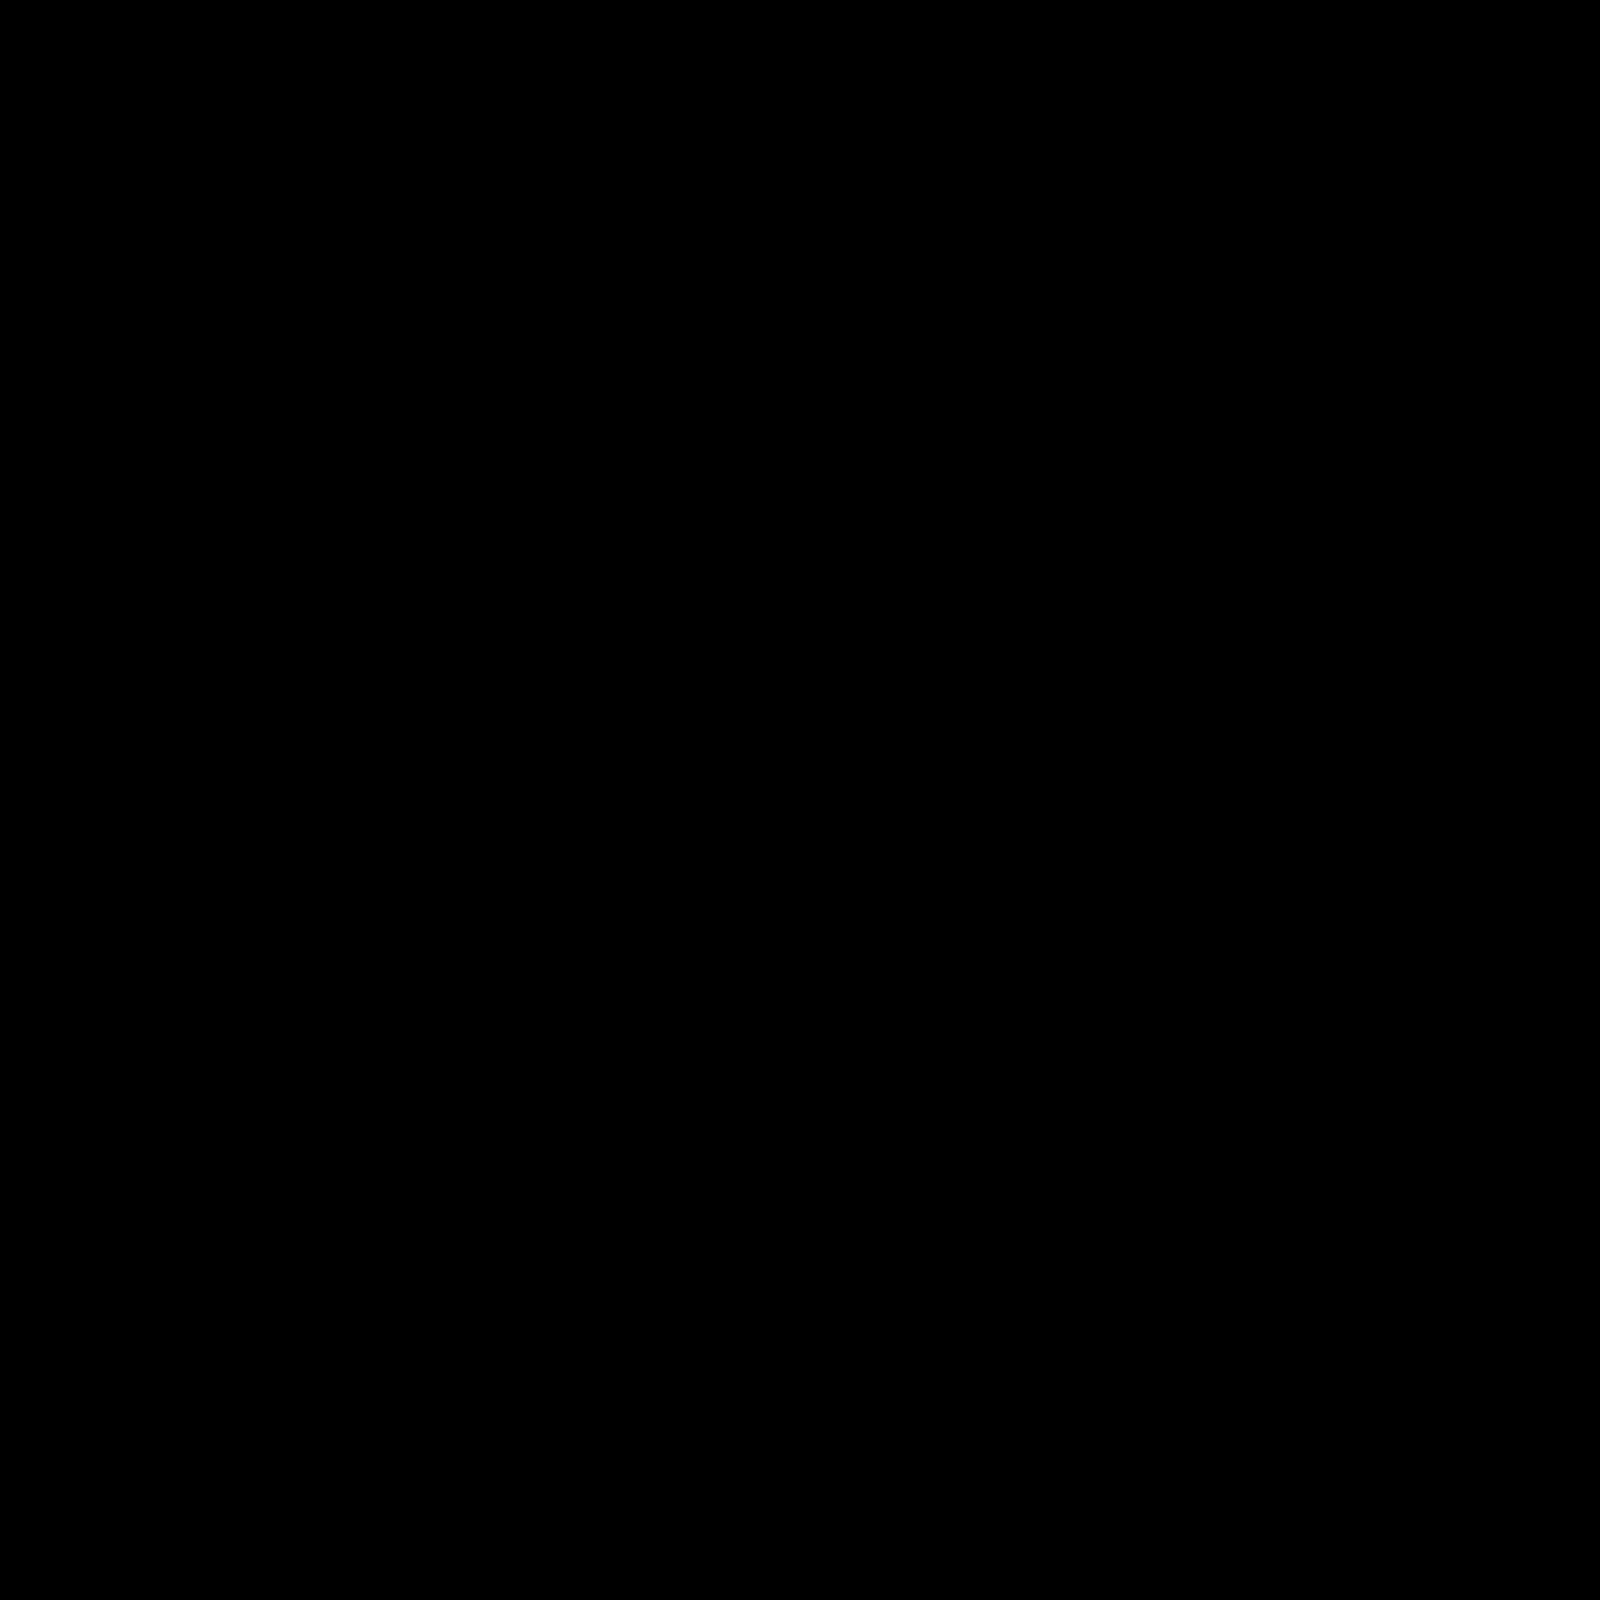 Mina Morska icon